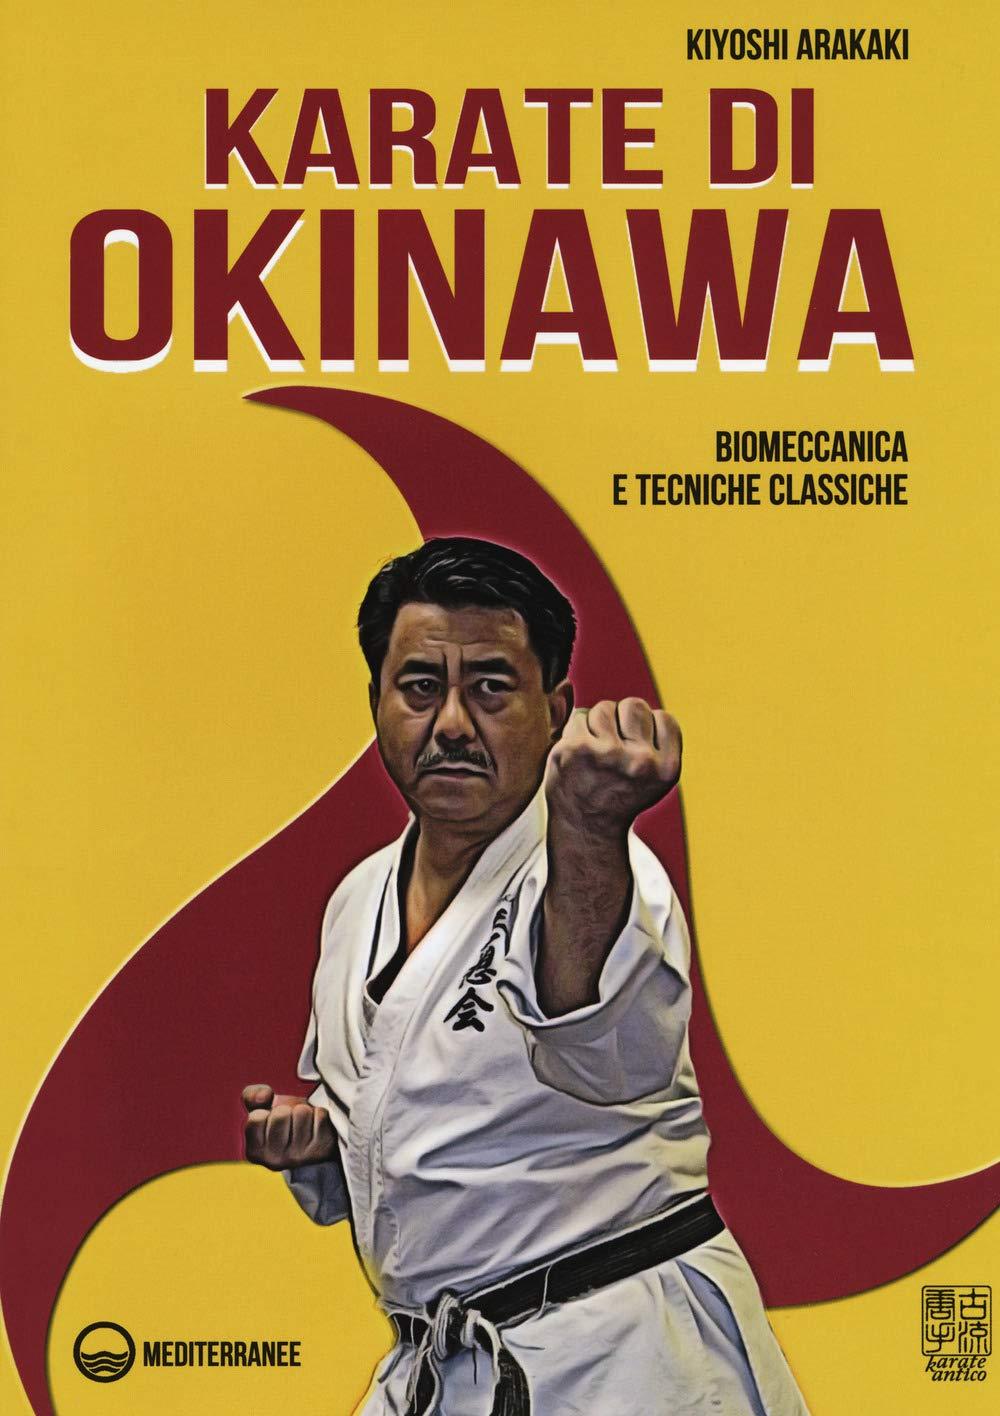 Okinawa incontri app